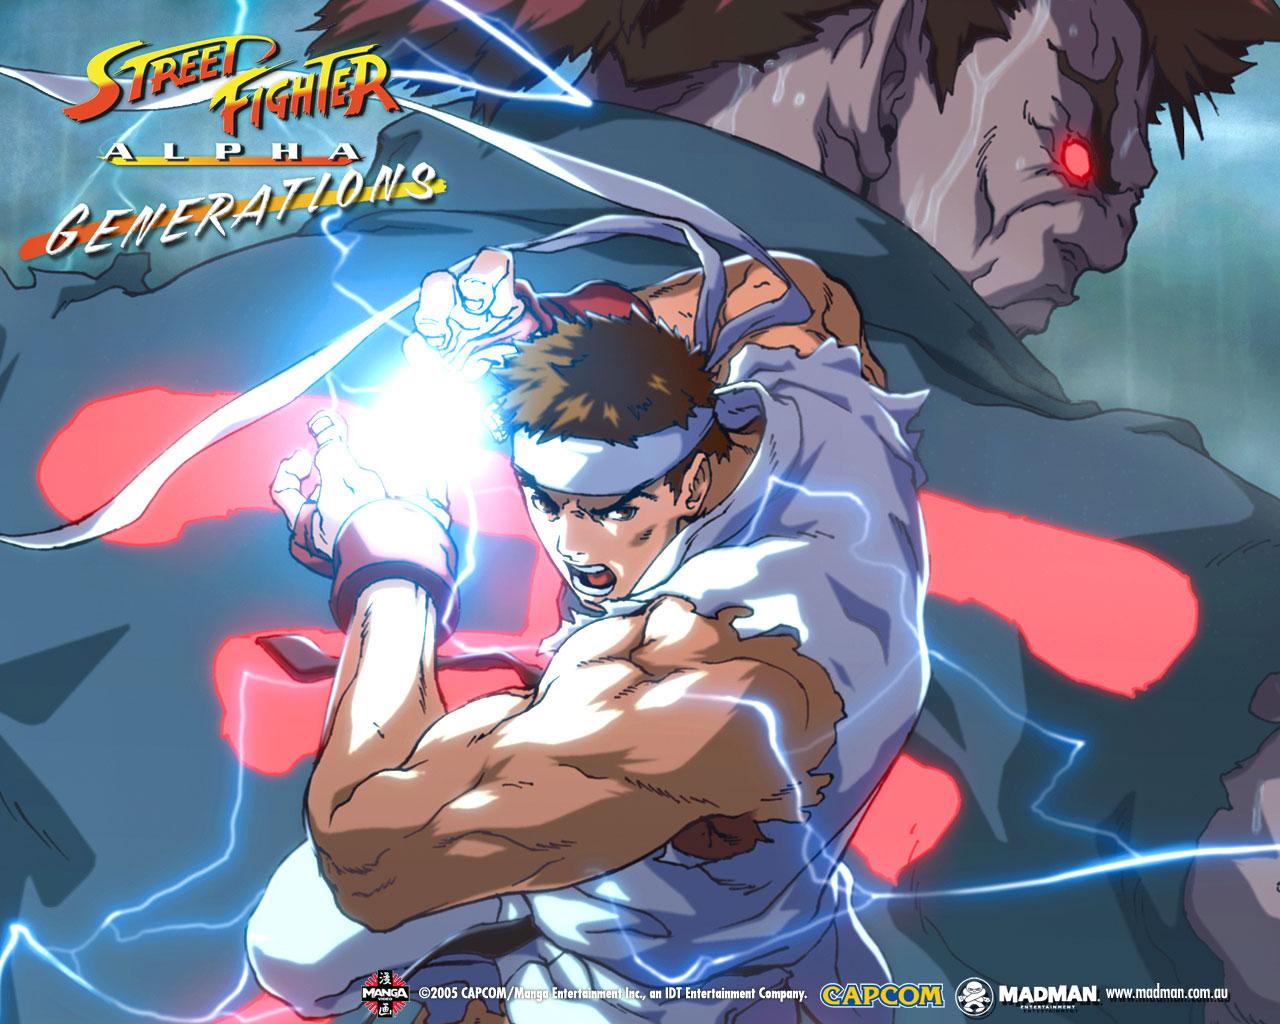 Street Fighter Alpha: Generations (ou Street Fighter Zero: Generations